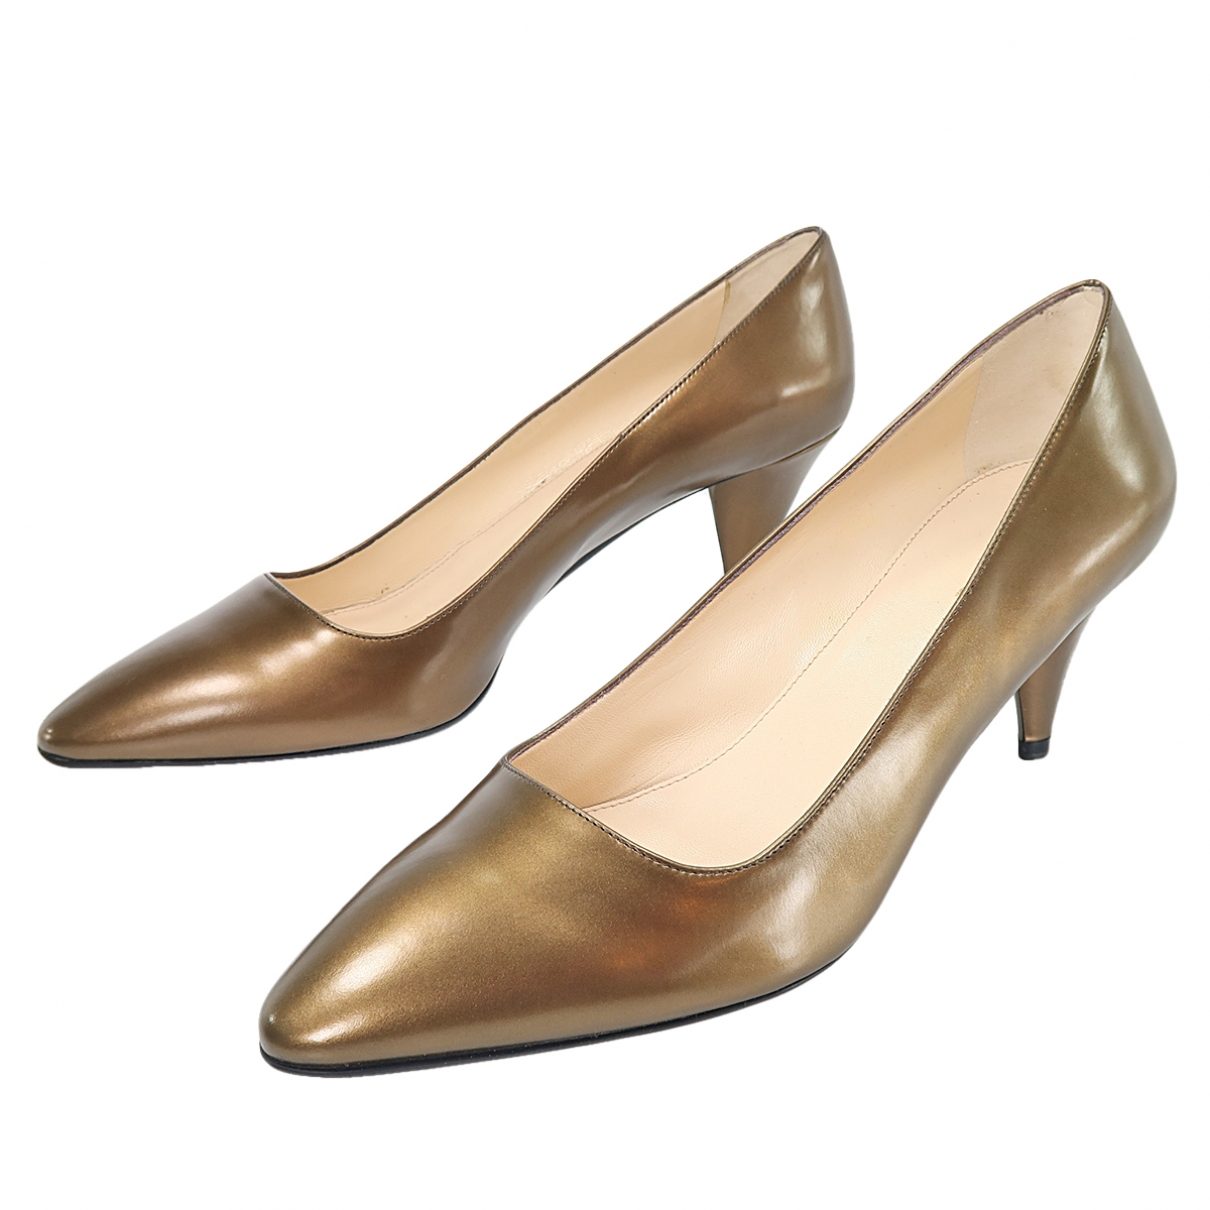 Prada \N Metallic Leather Heels for Women 41.5 EU